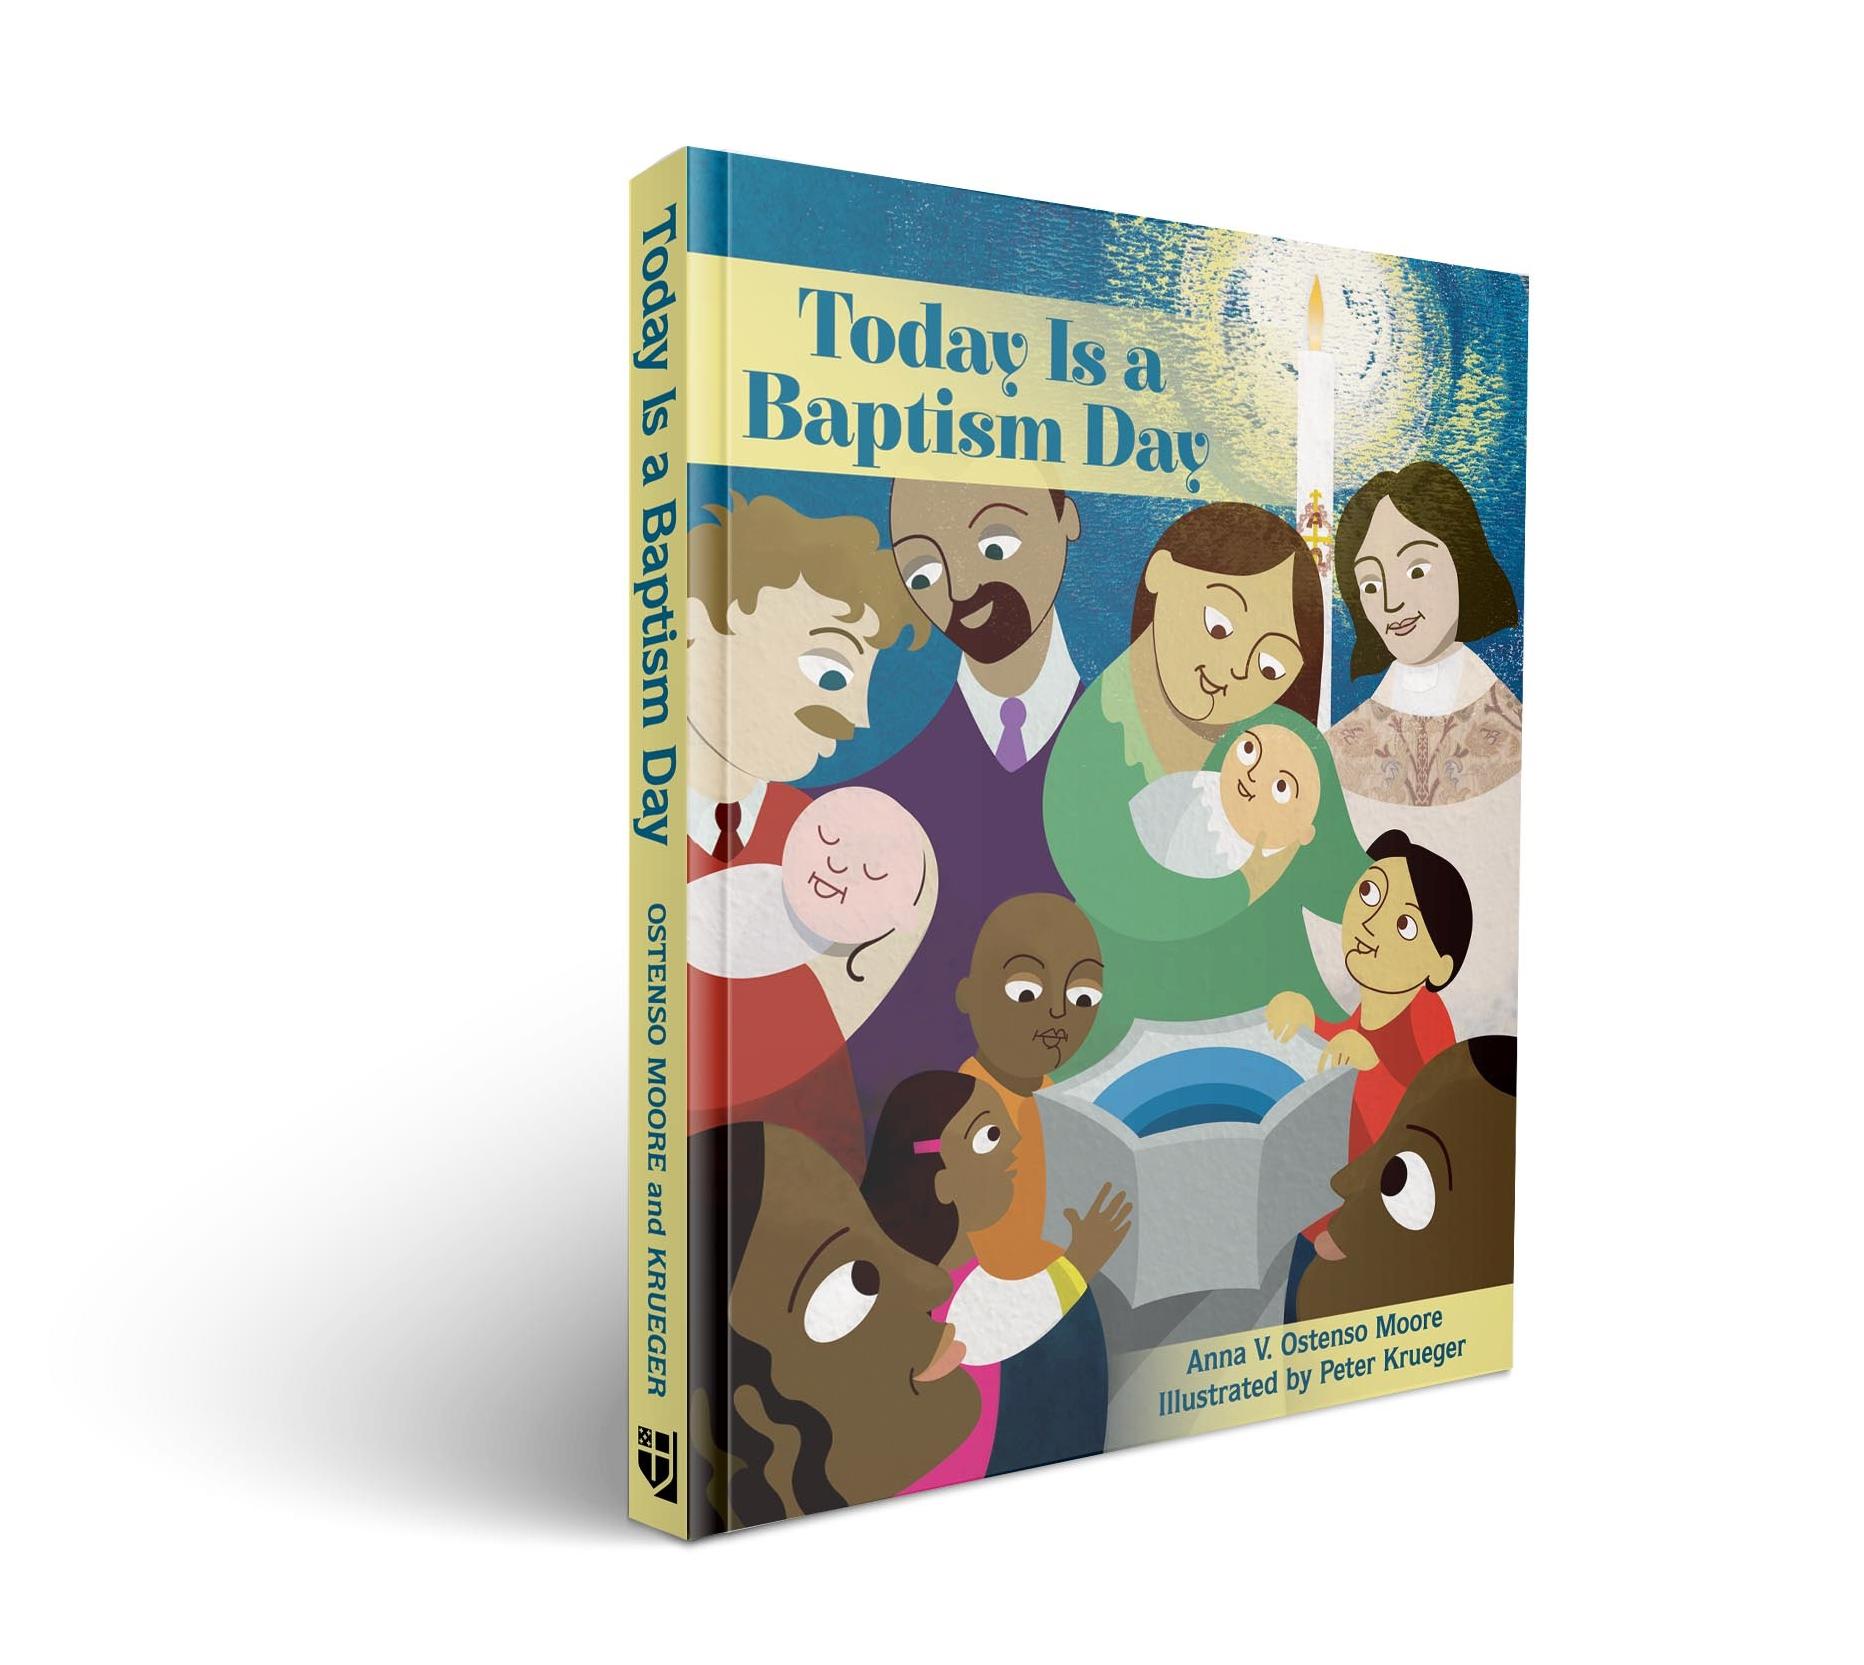 TodayIsABaptismDay_3D cover.jpg